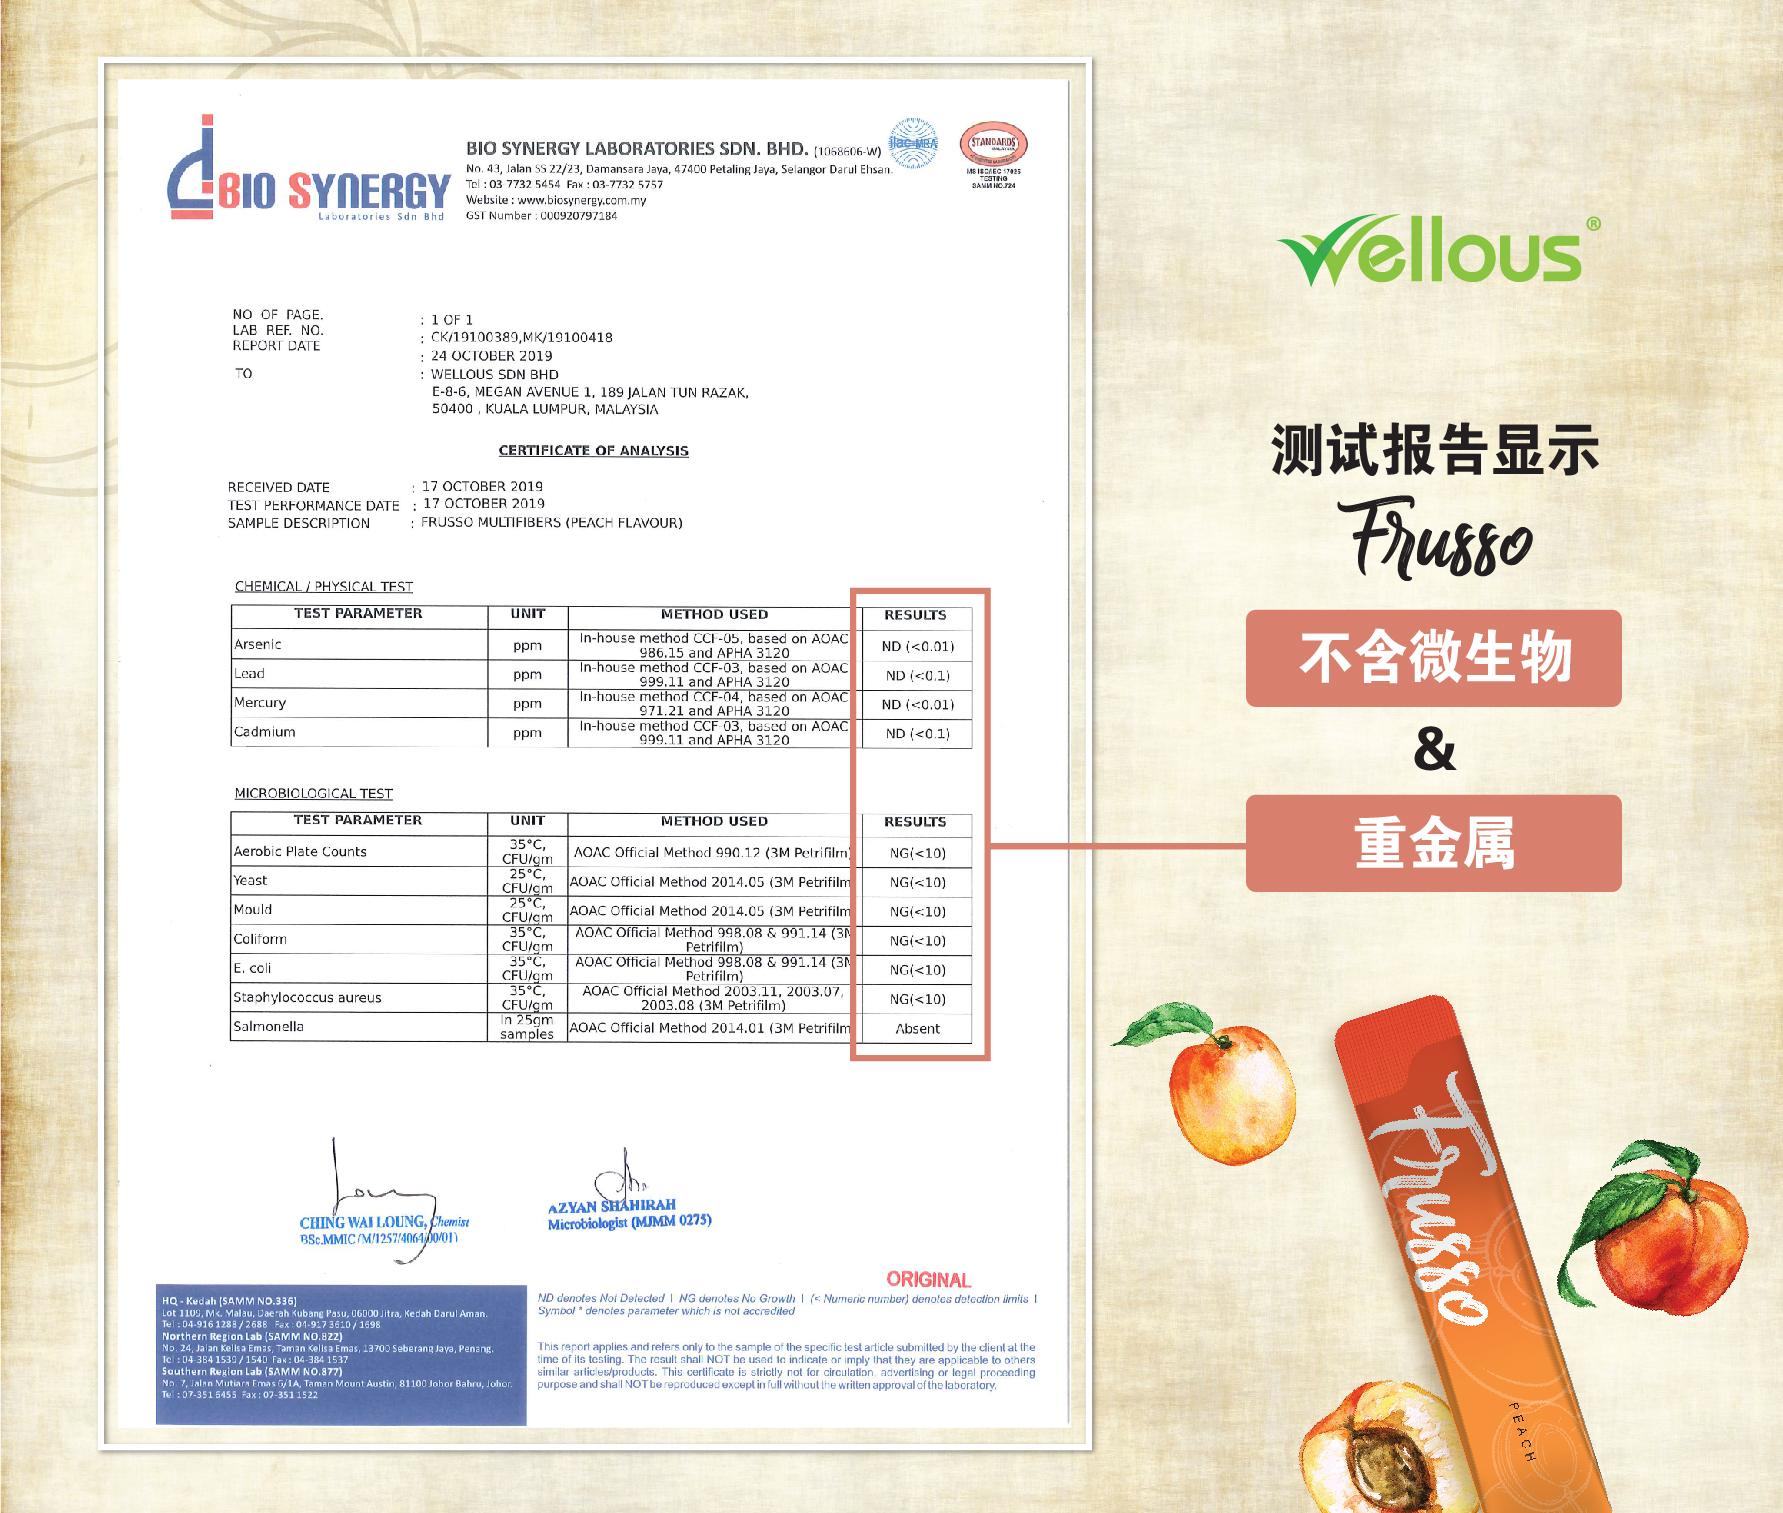 Frusso_COA (No Heavy Metals No Microbes)_peach_CN